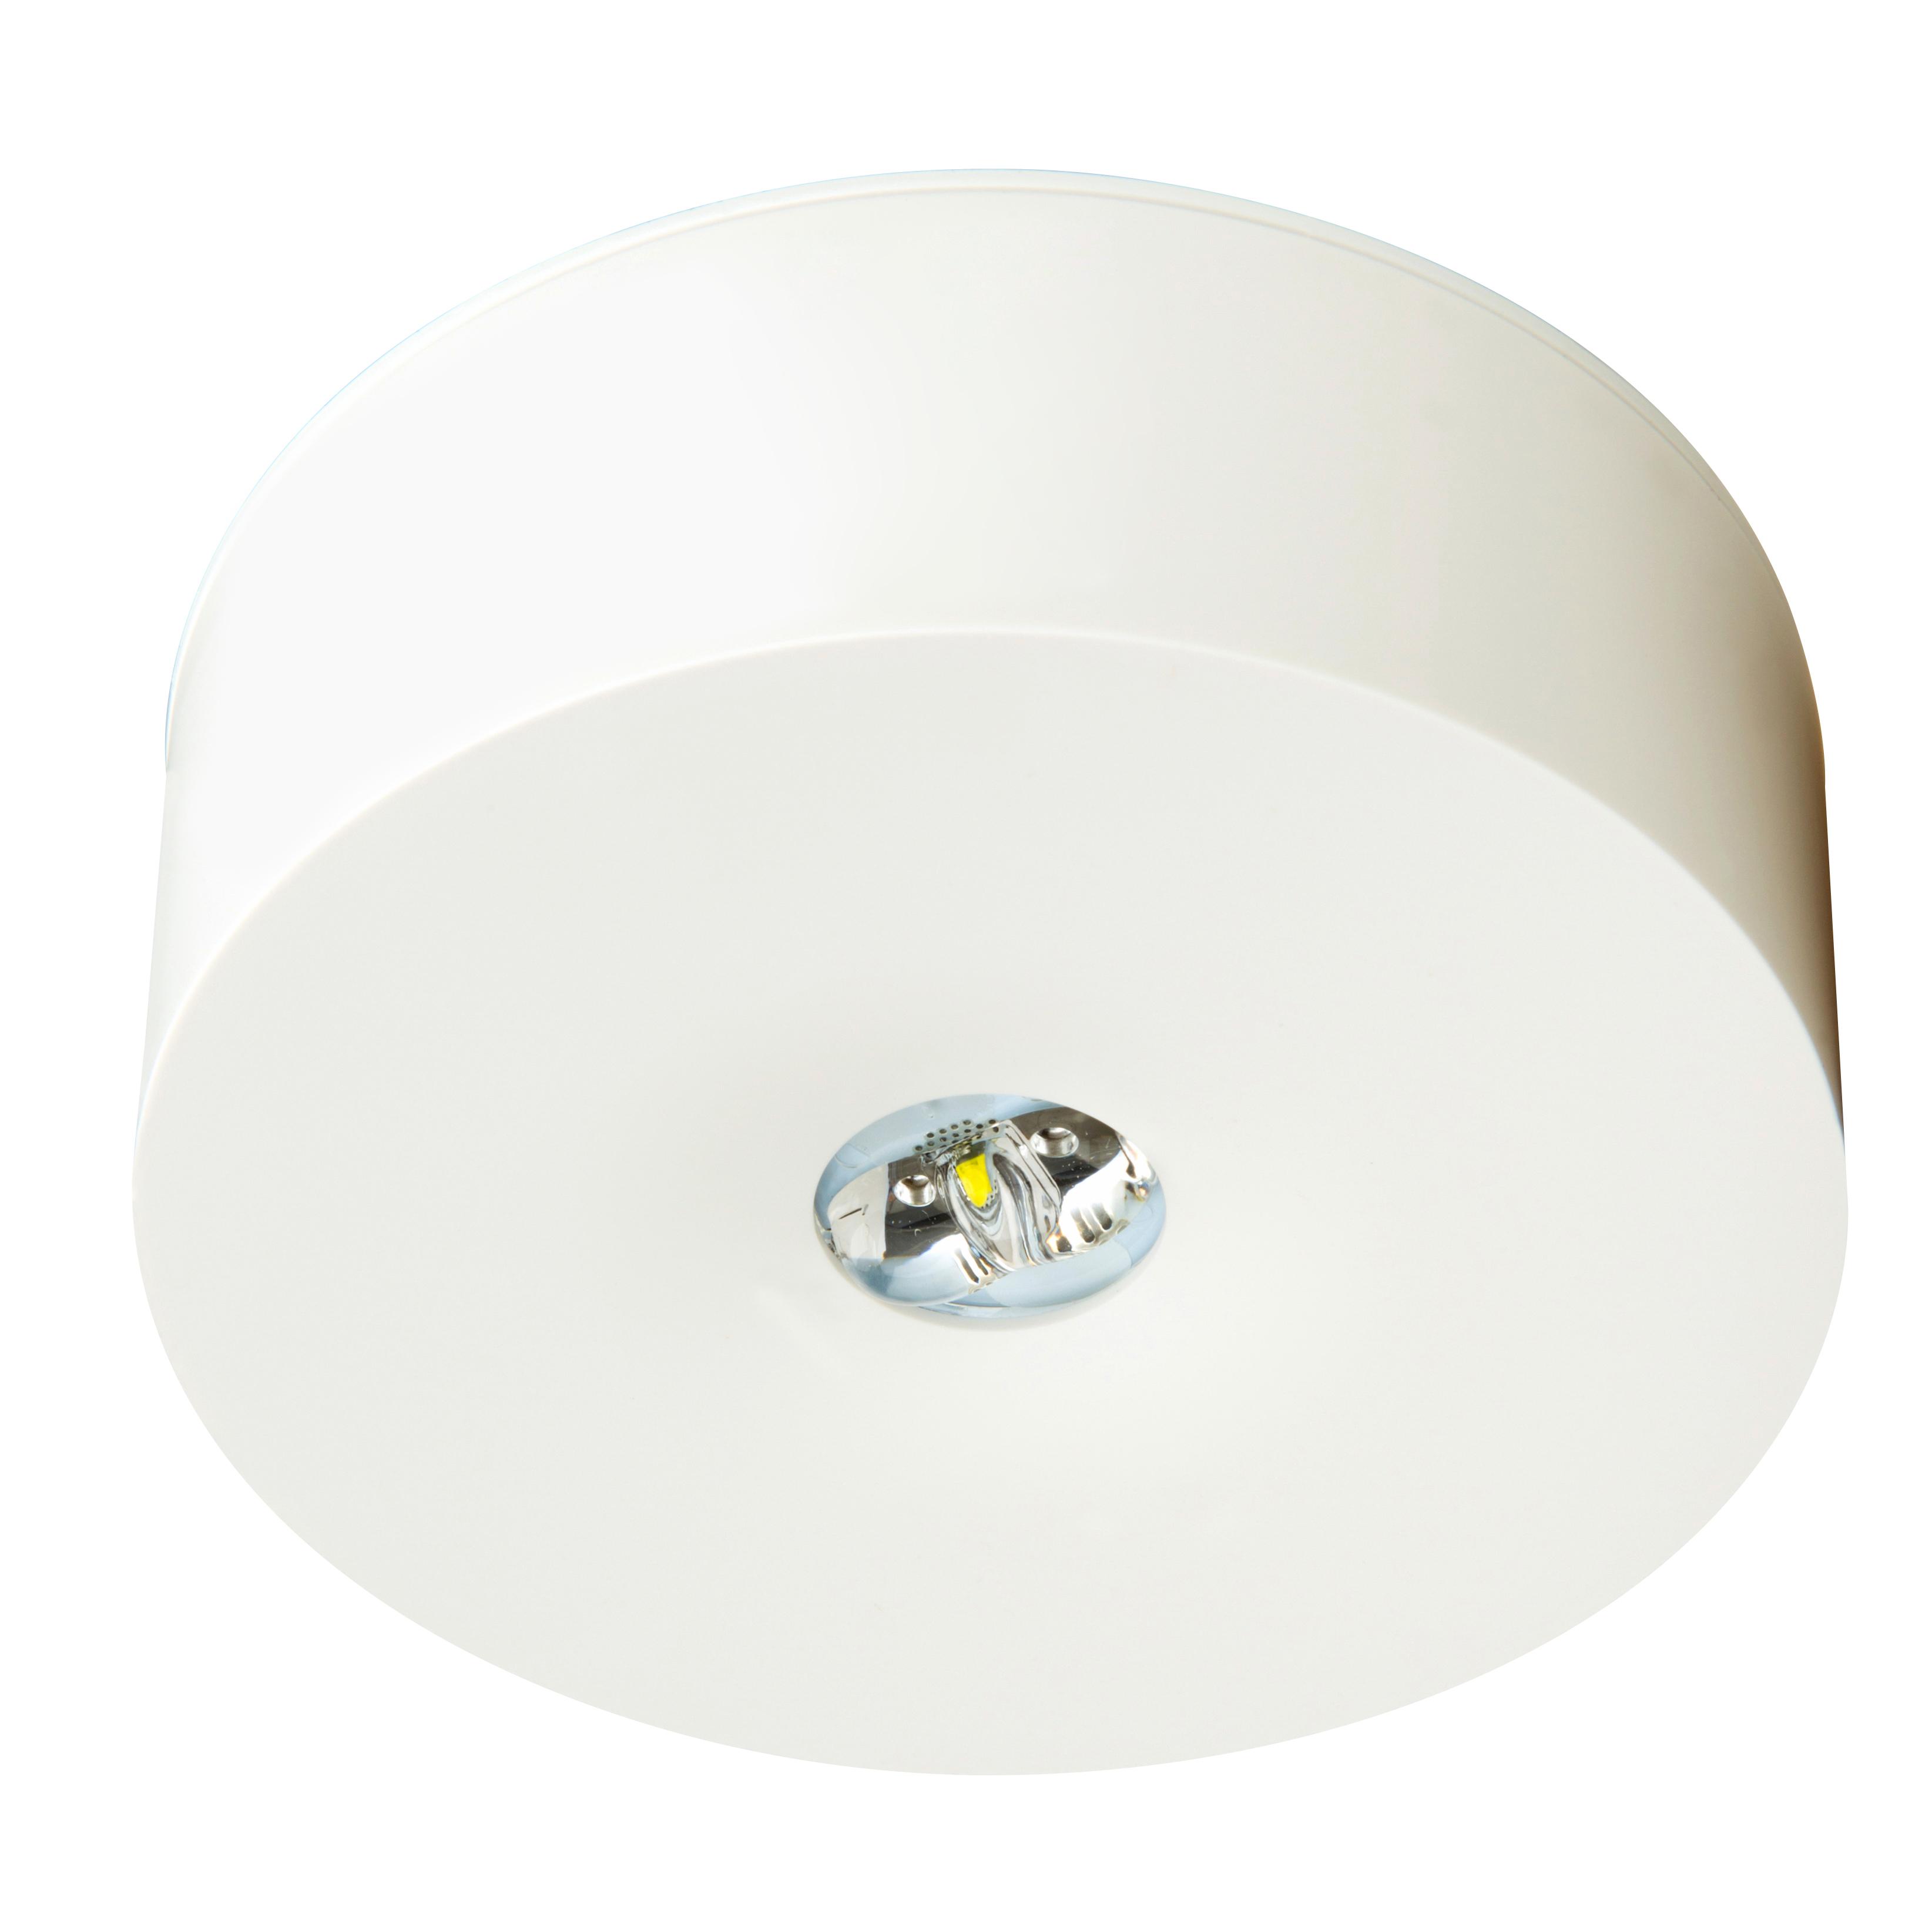 1 Stk Notleuchte IL Wireless 1x3W ERT-LED 3h 230VAC Flur NLILDF023W